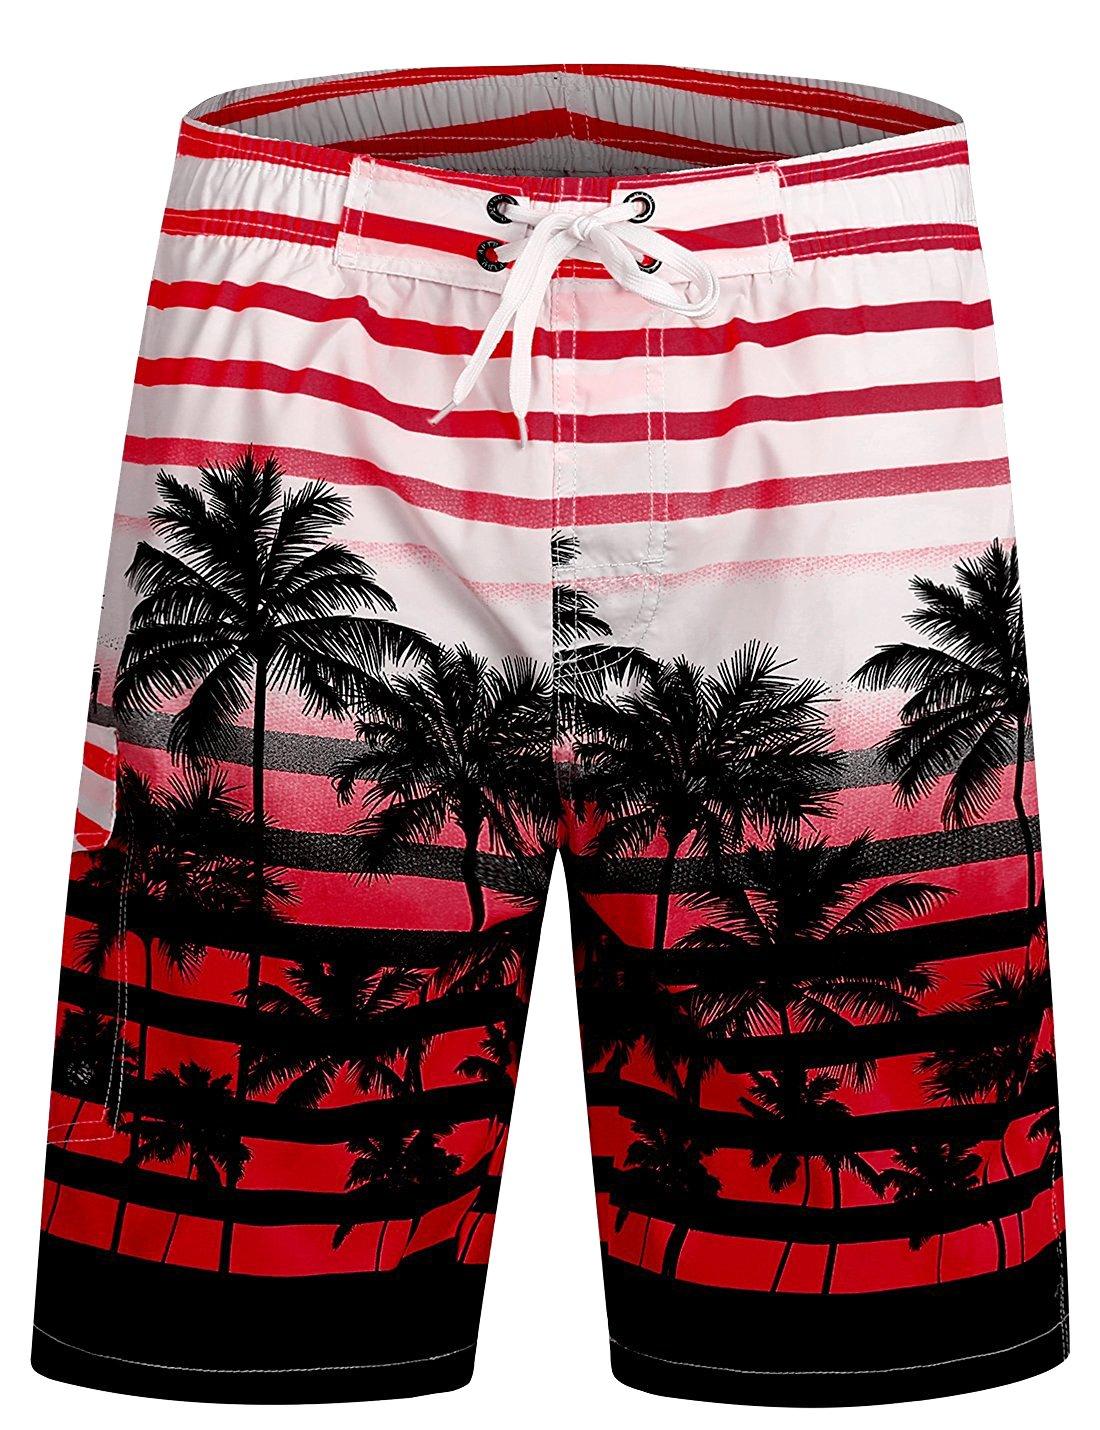 ICEbear Mens Swim Trunks Quick Dry Water Beach Board Shorts Cool Sportwear,red,XL